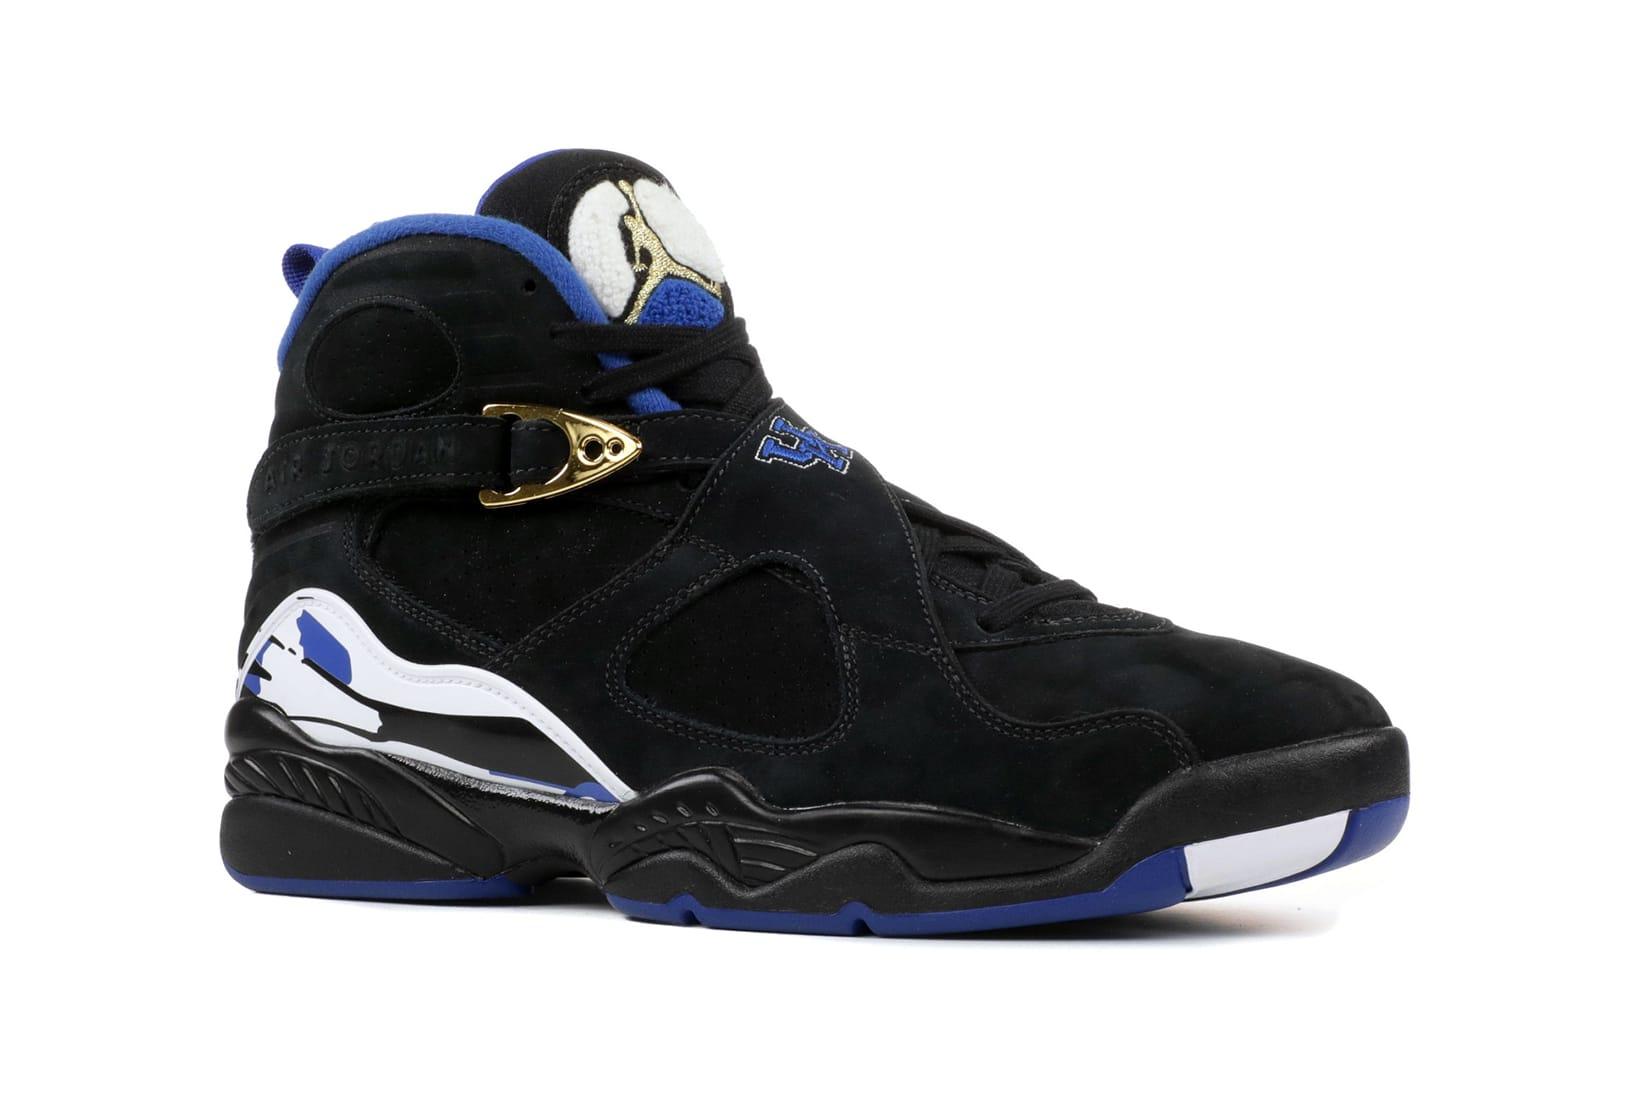 Drake OVO x Air Jordan 8 on Sale for